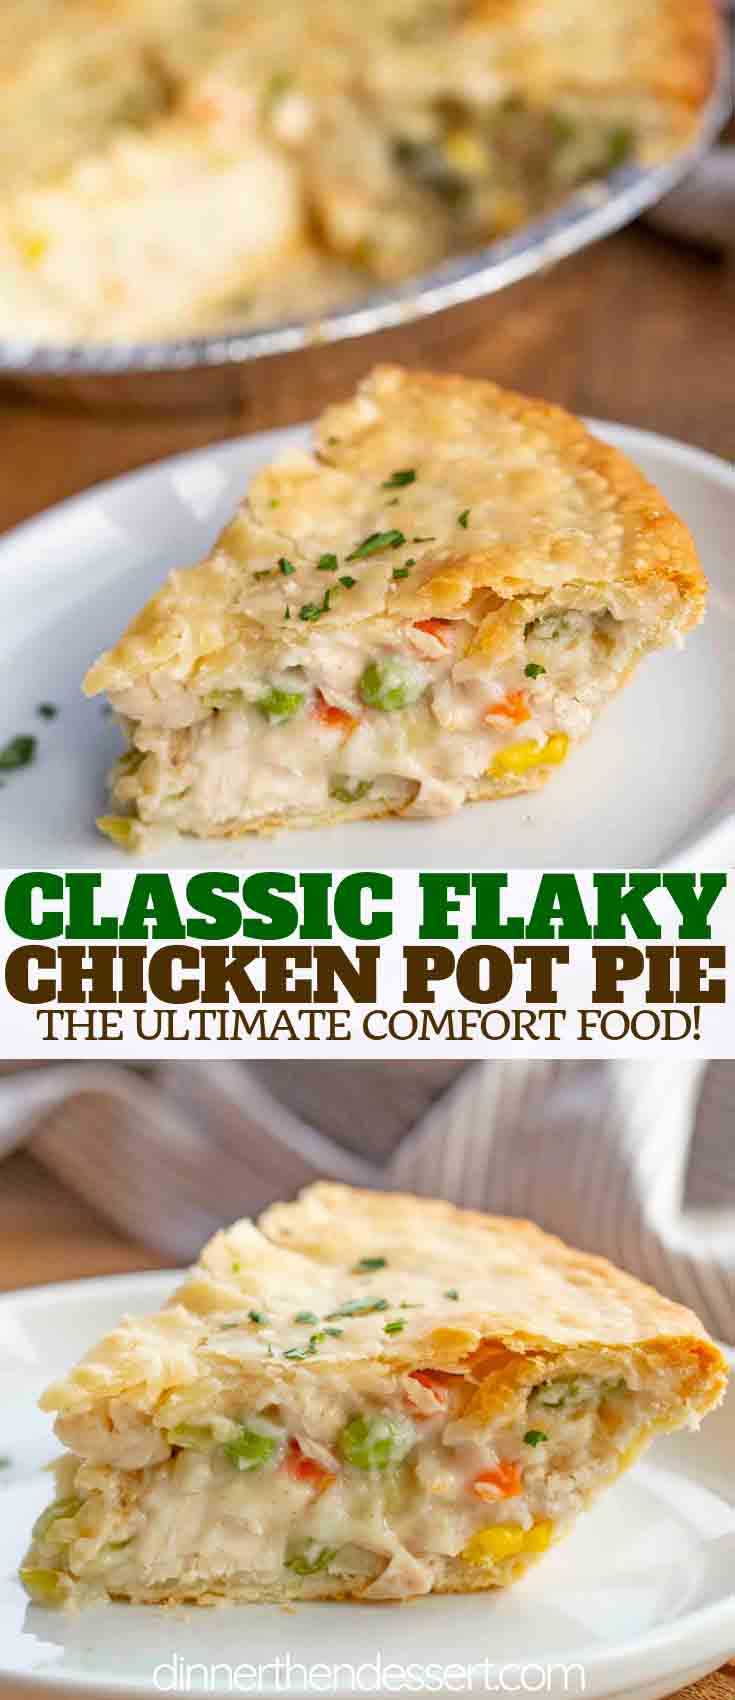 Classic Chicken Pot Pie Flaky Crust Dinner Then Dessert